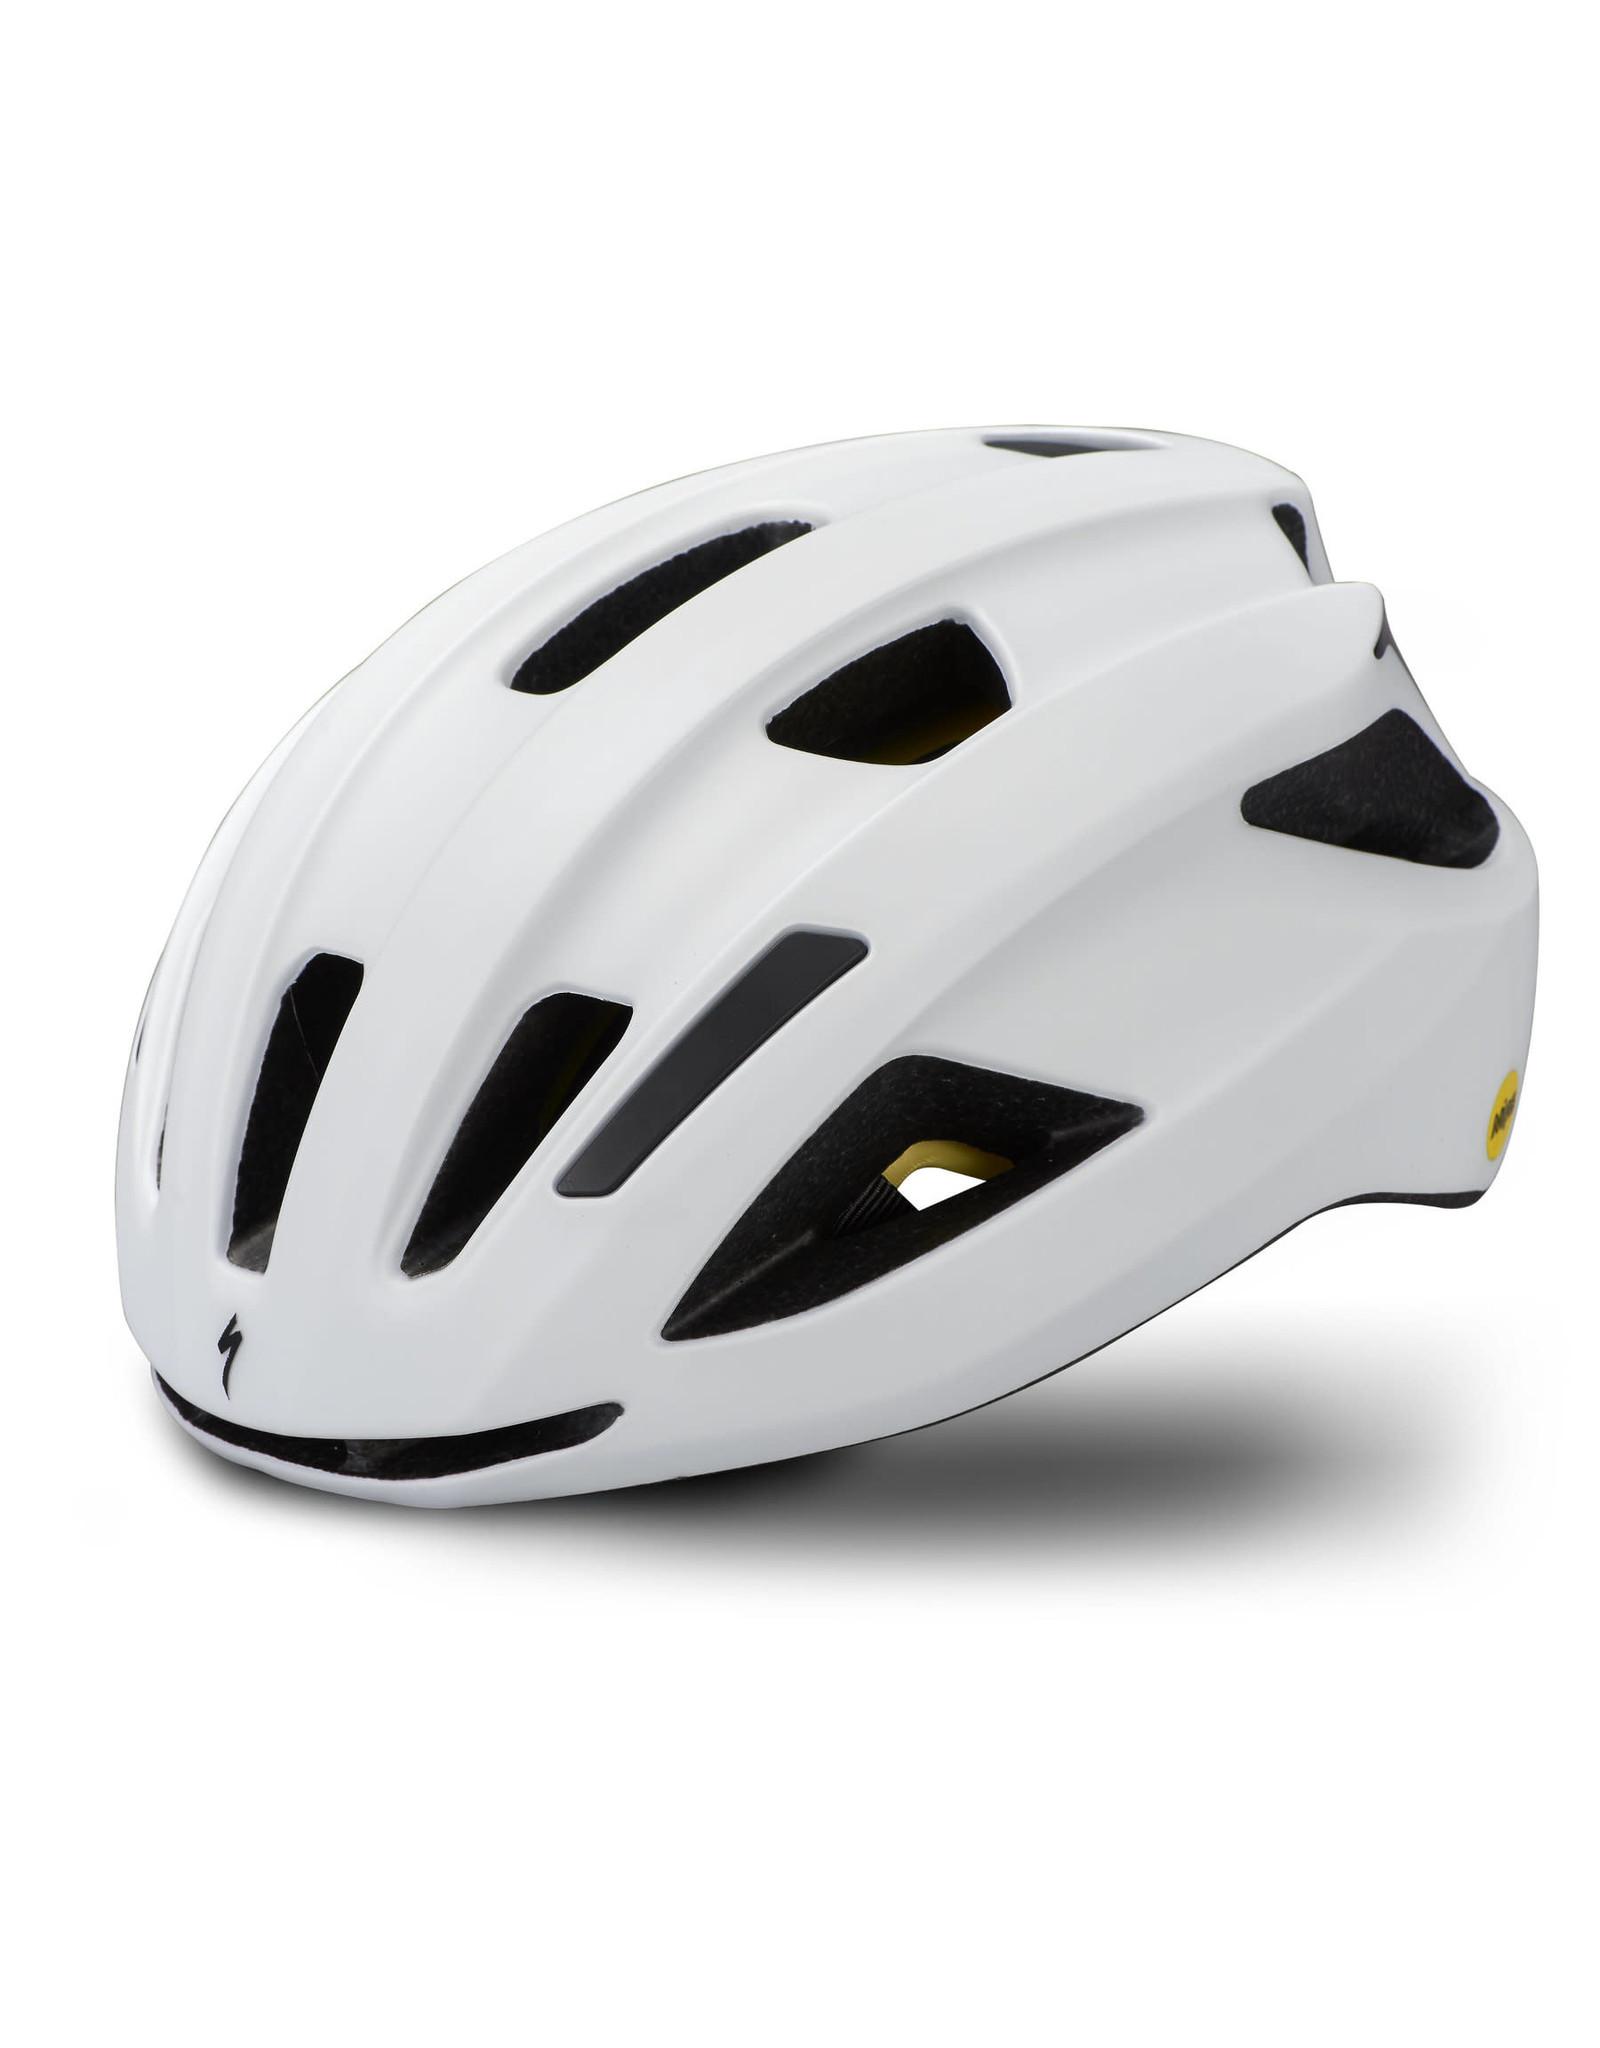 Specialized Helmet Spec Align II  MIPS Wht  M/L